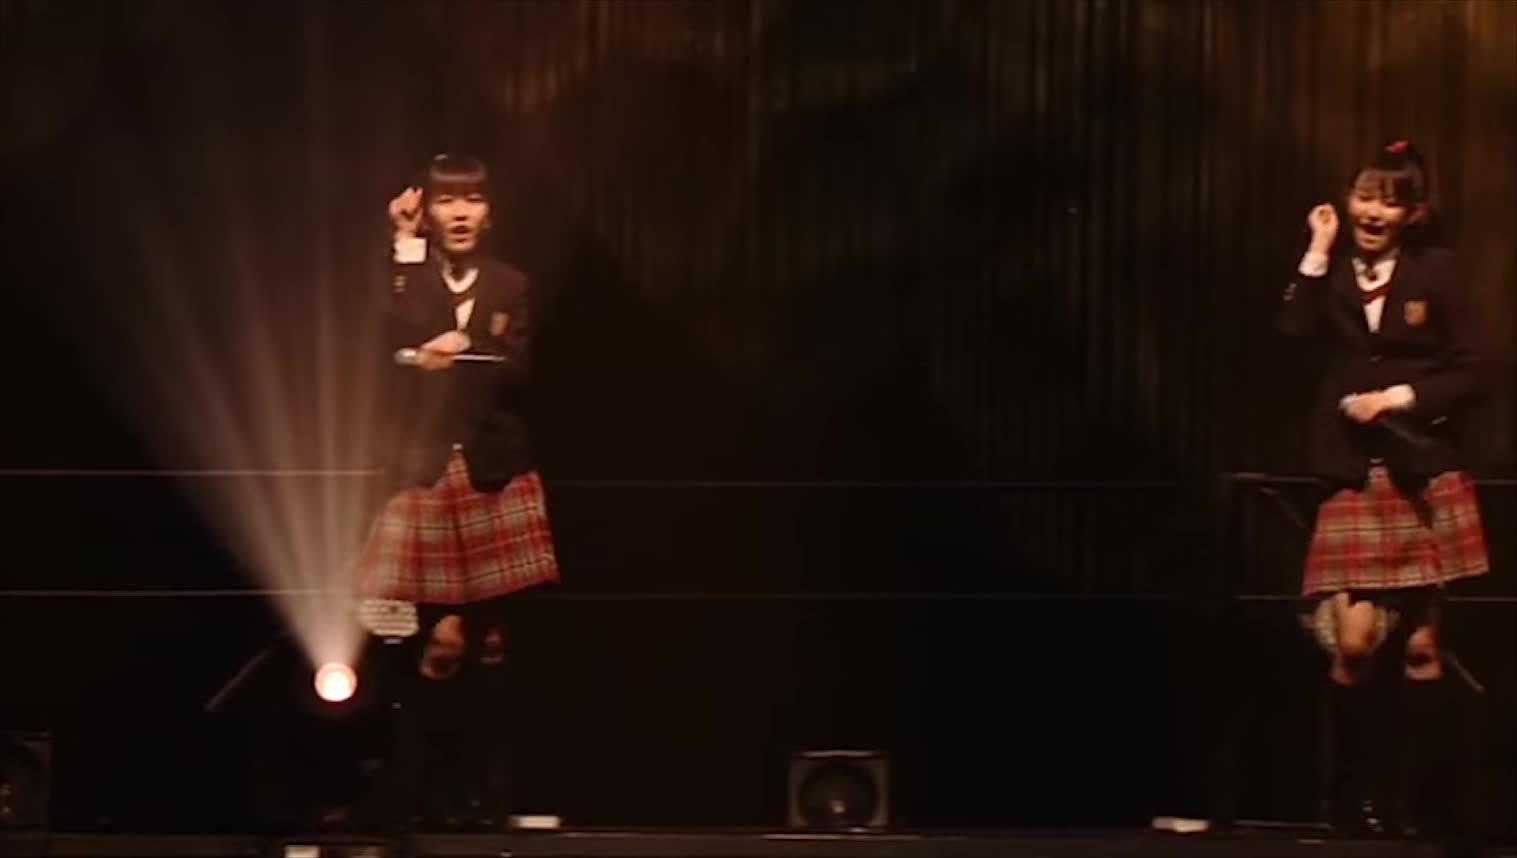 SakuraGakuin, sakuragakuin, SuHandLoop2 GIFs